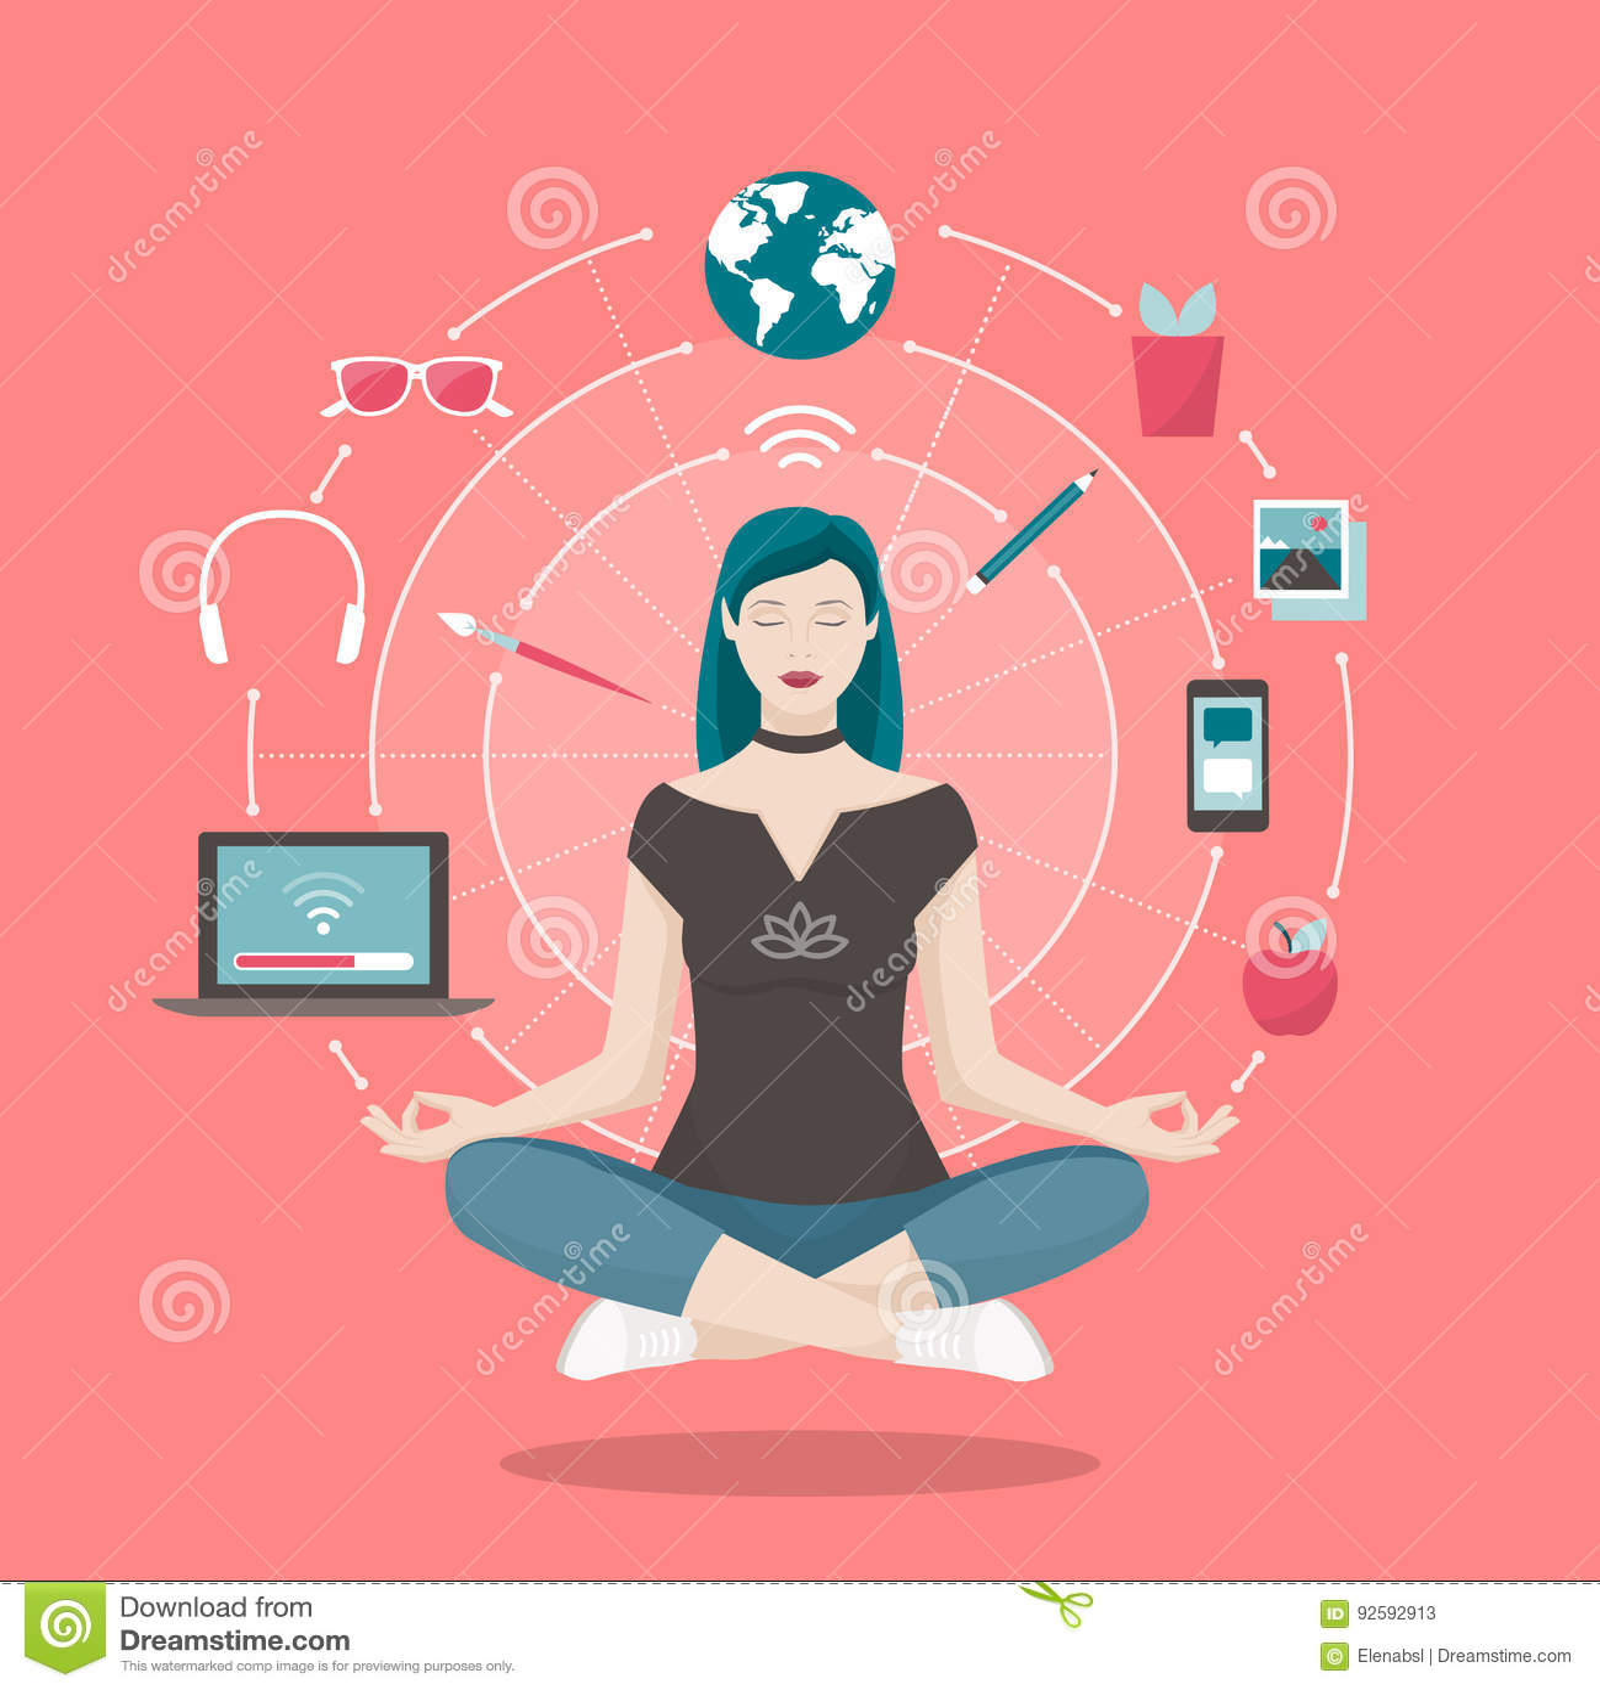 mindfulness cartoons  illustrations  u0026 vector stock images